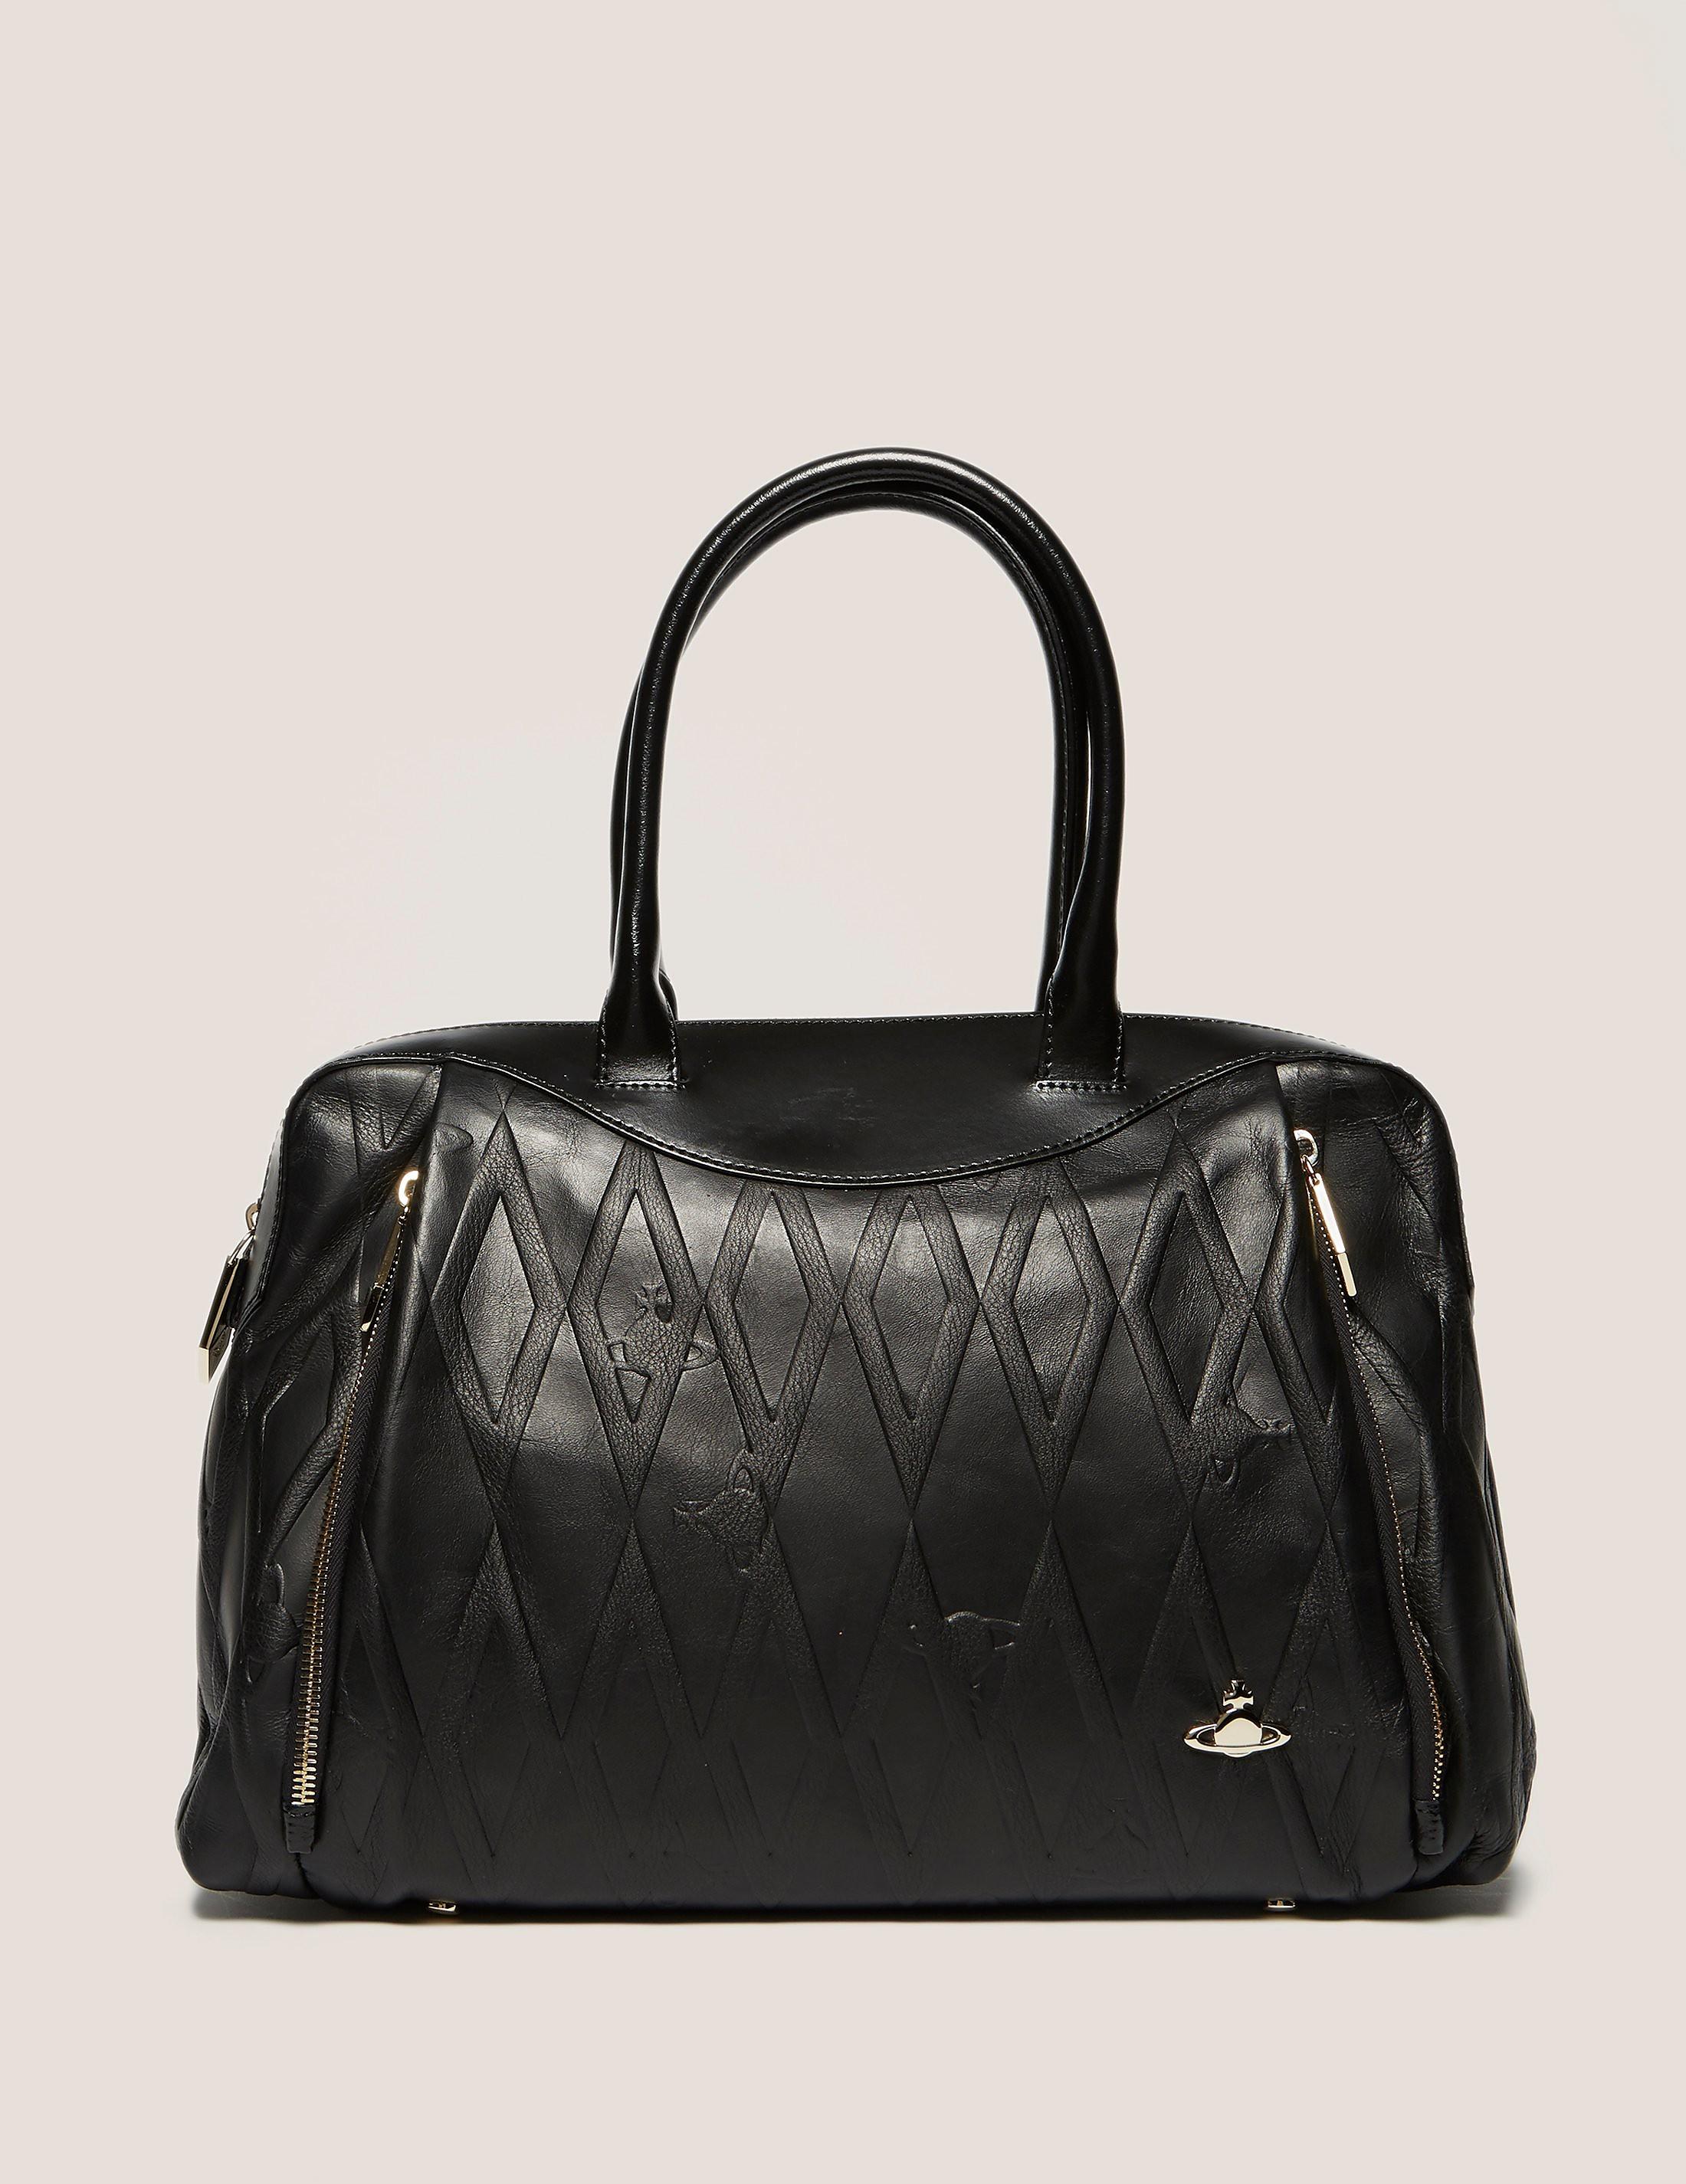 Vivienne Westwood Diamond Orb Shopper Bag